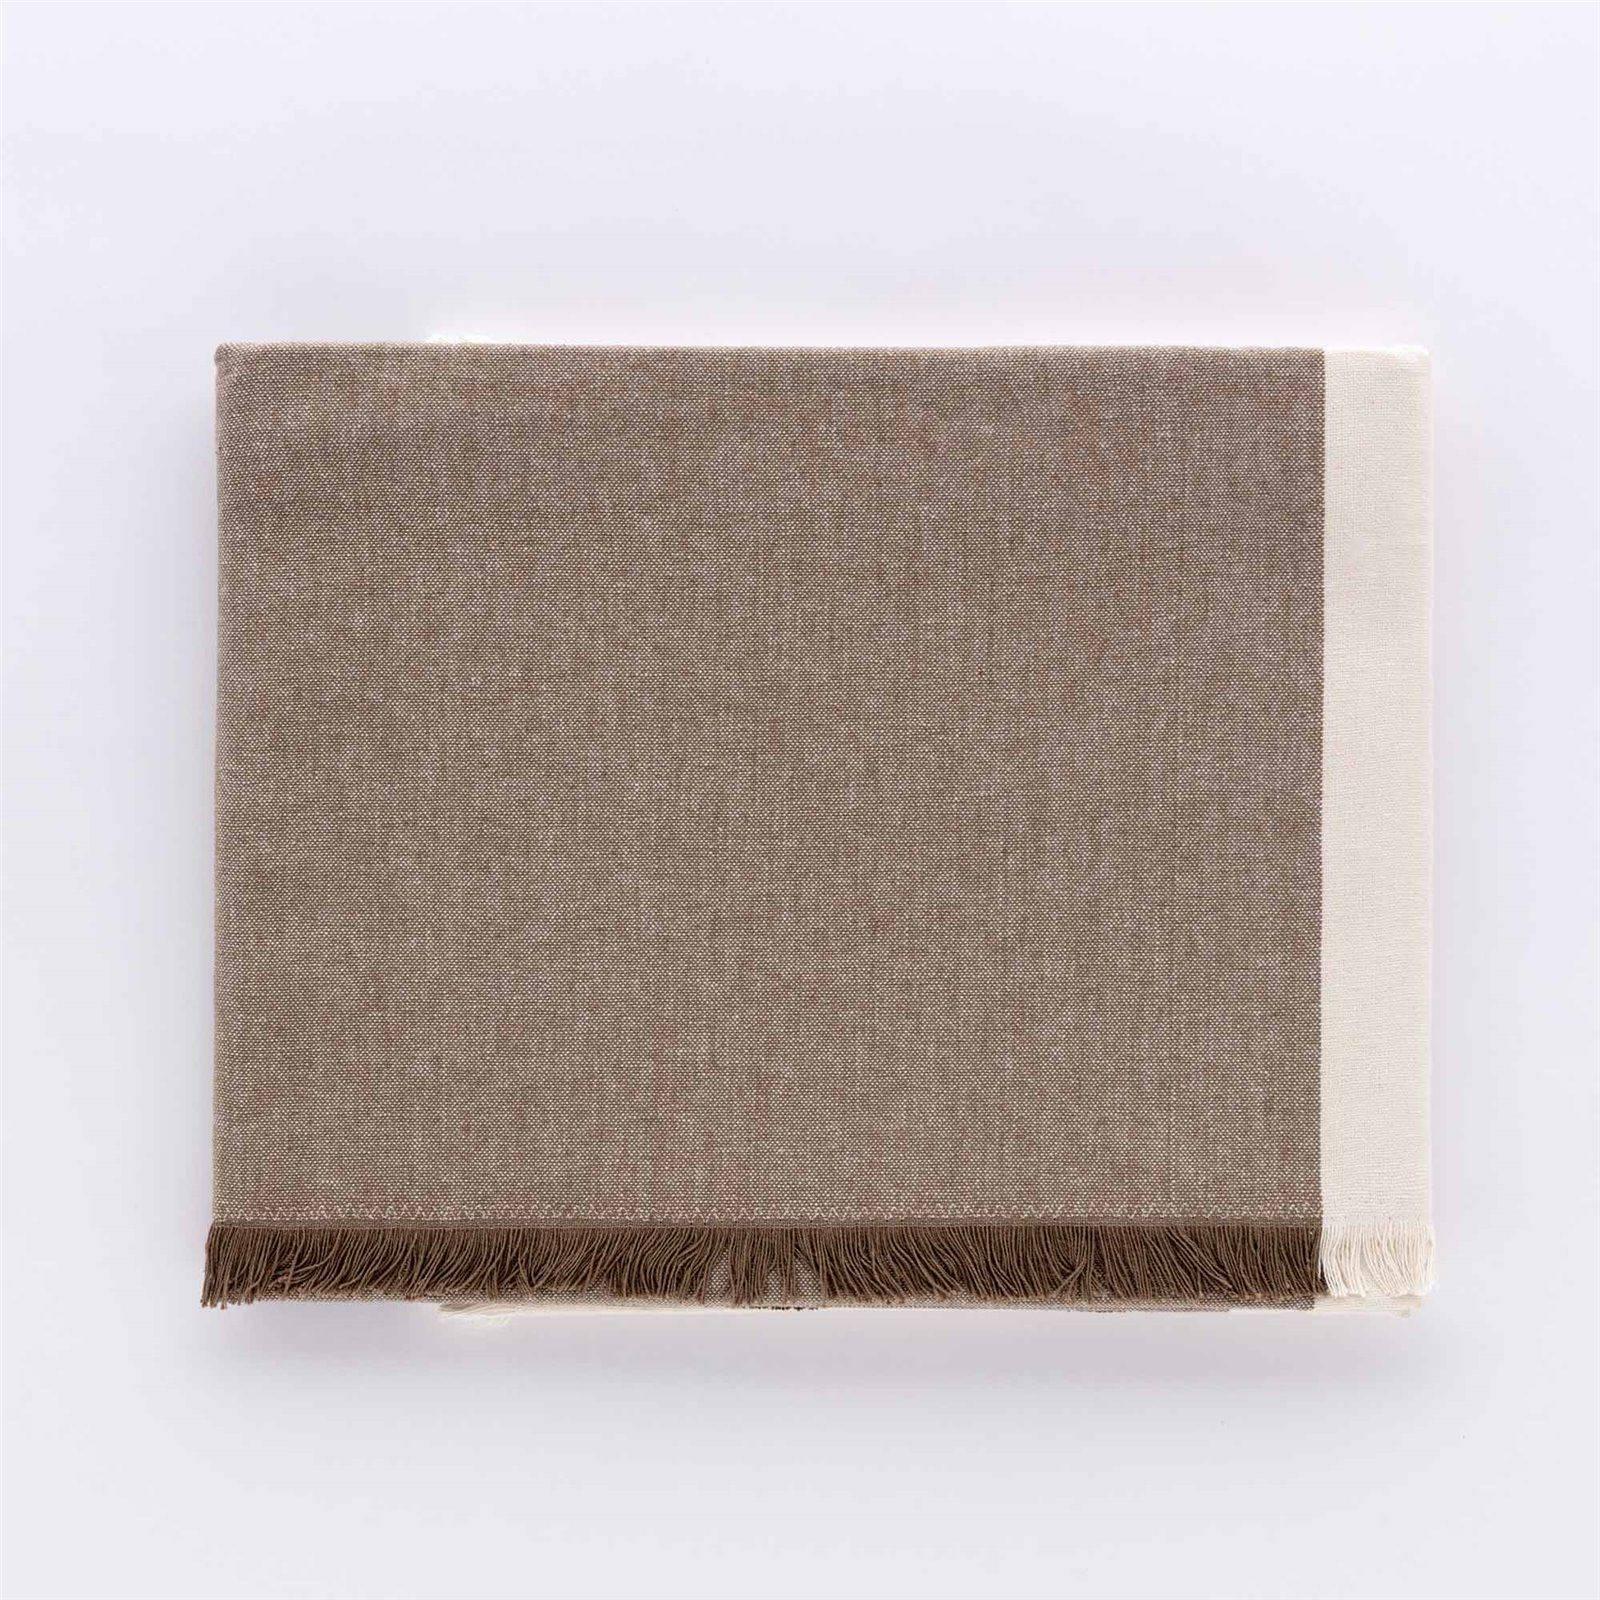 Gardens flannel sheet set